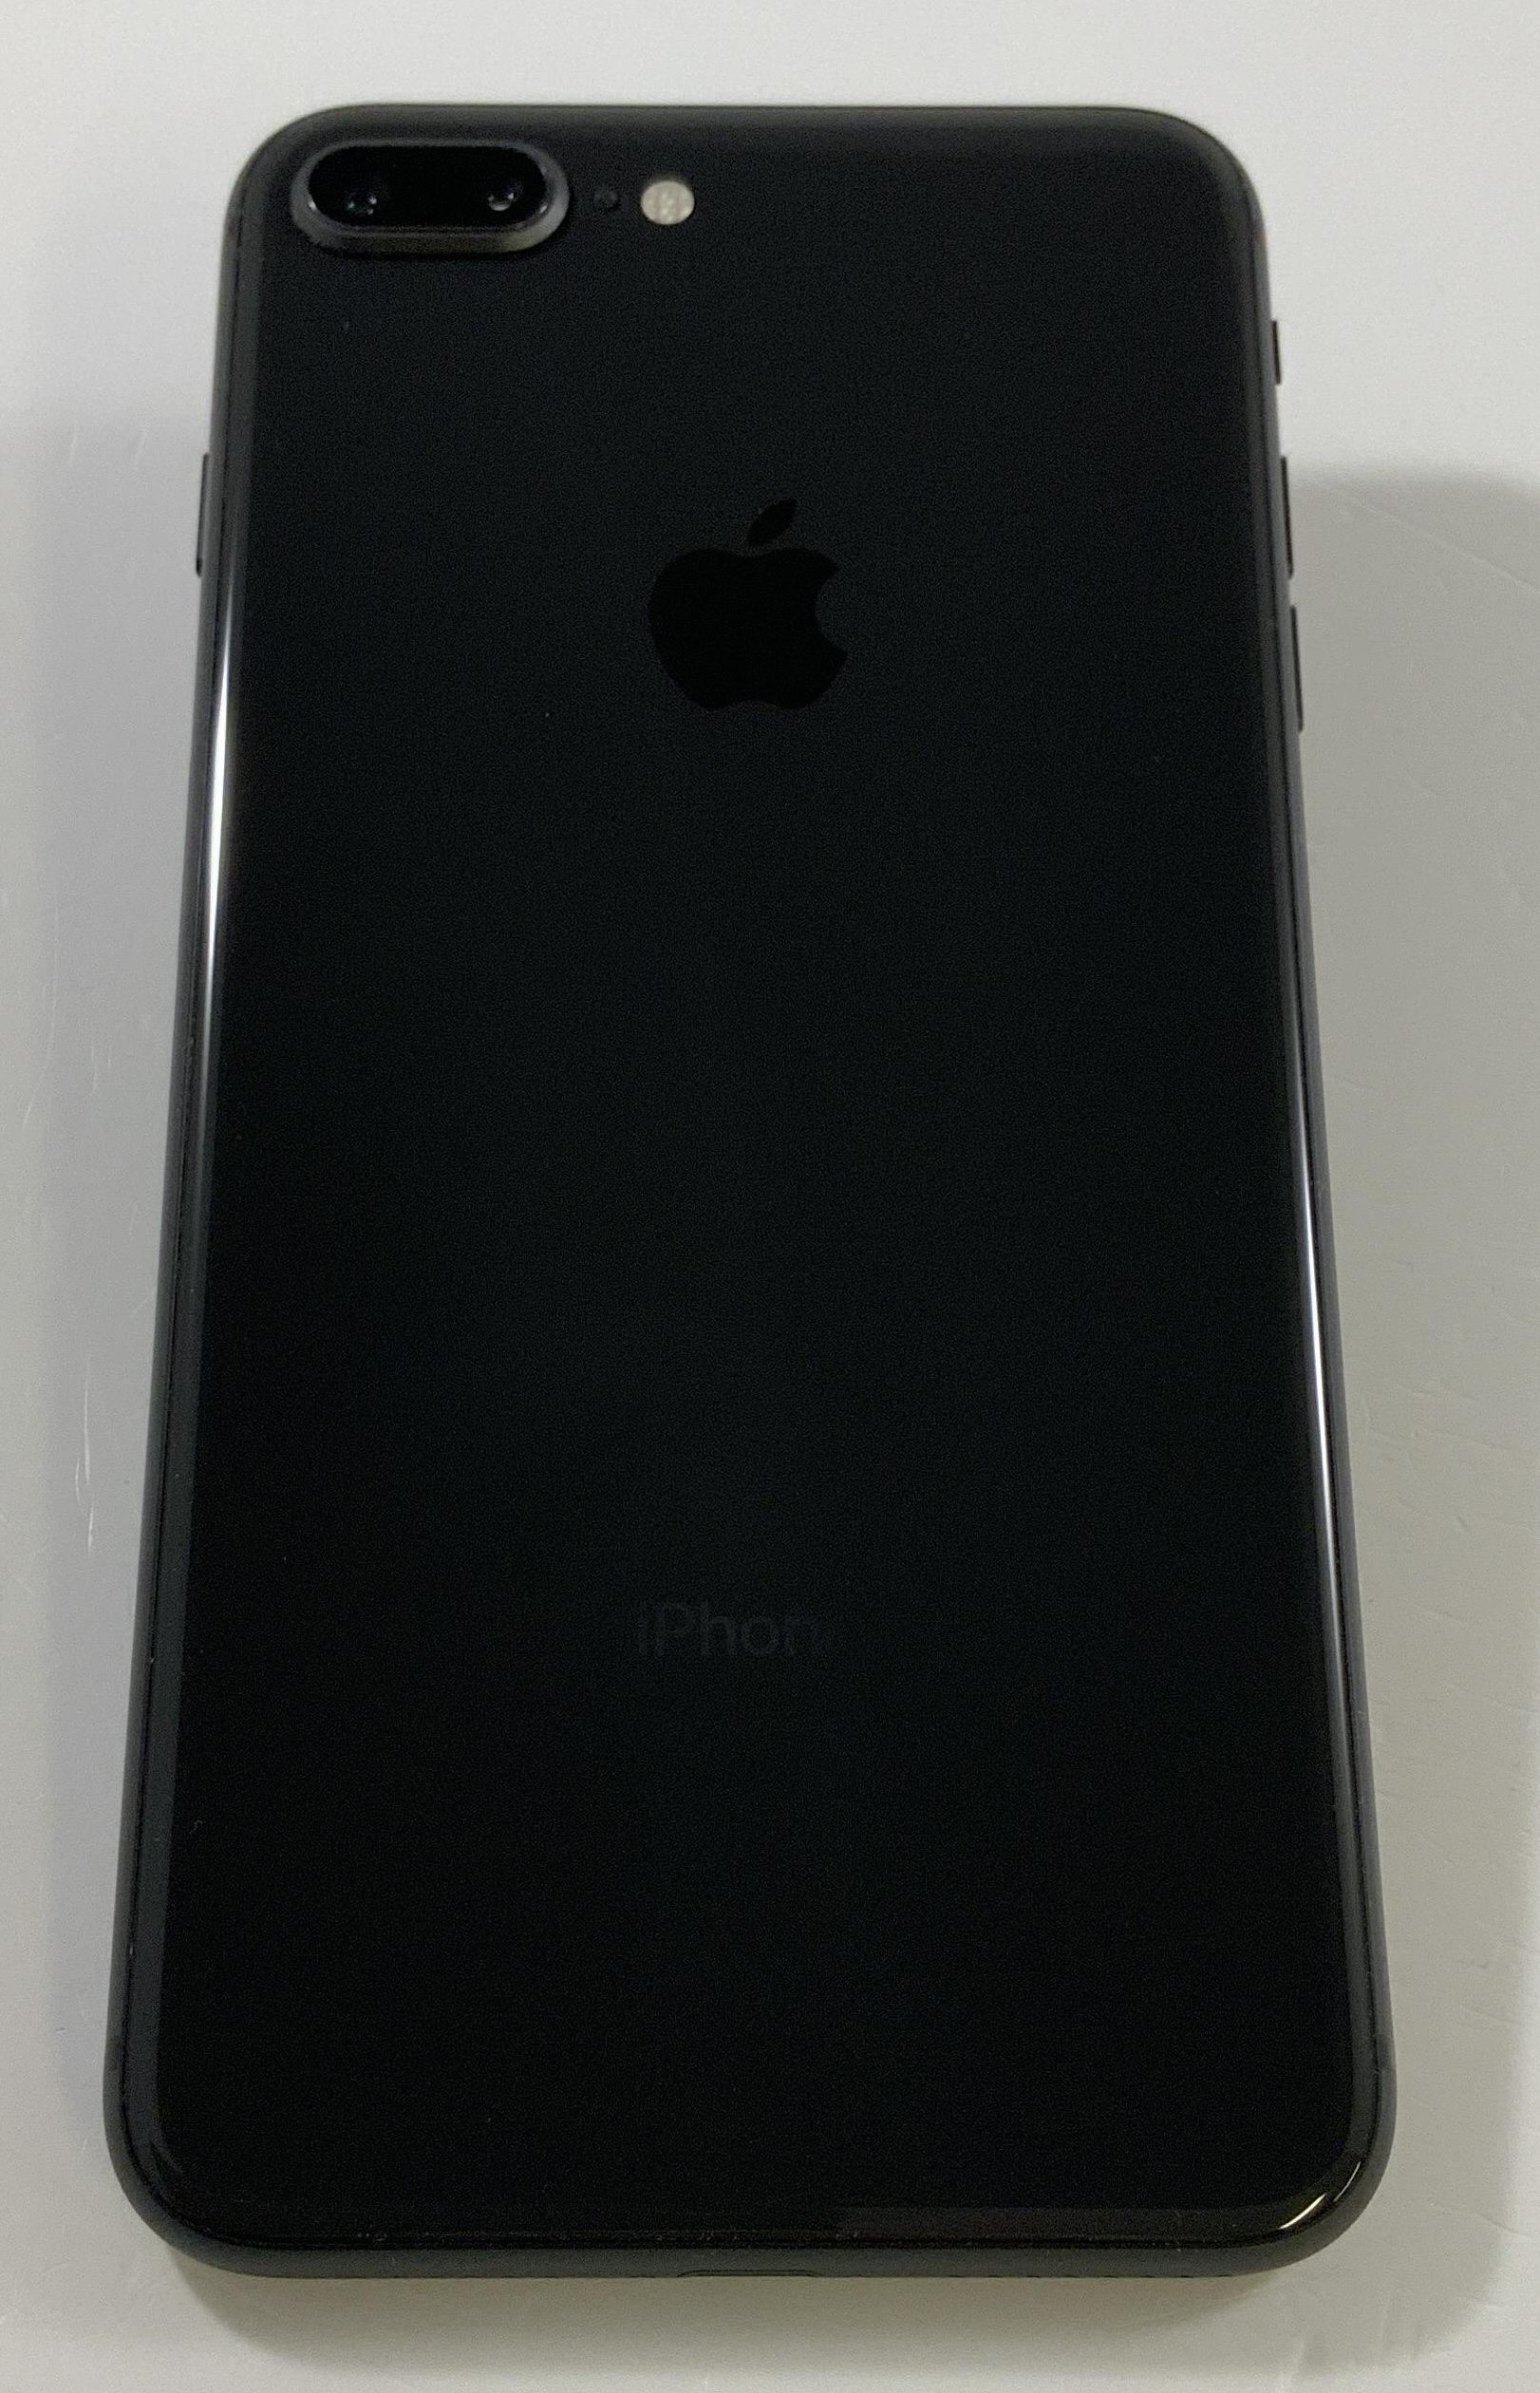 iPhone 8 Plus 256GB, 256GB, Space Gray, obraz 2